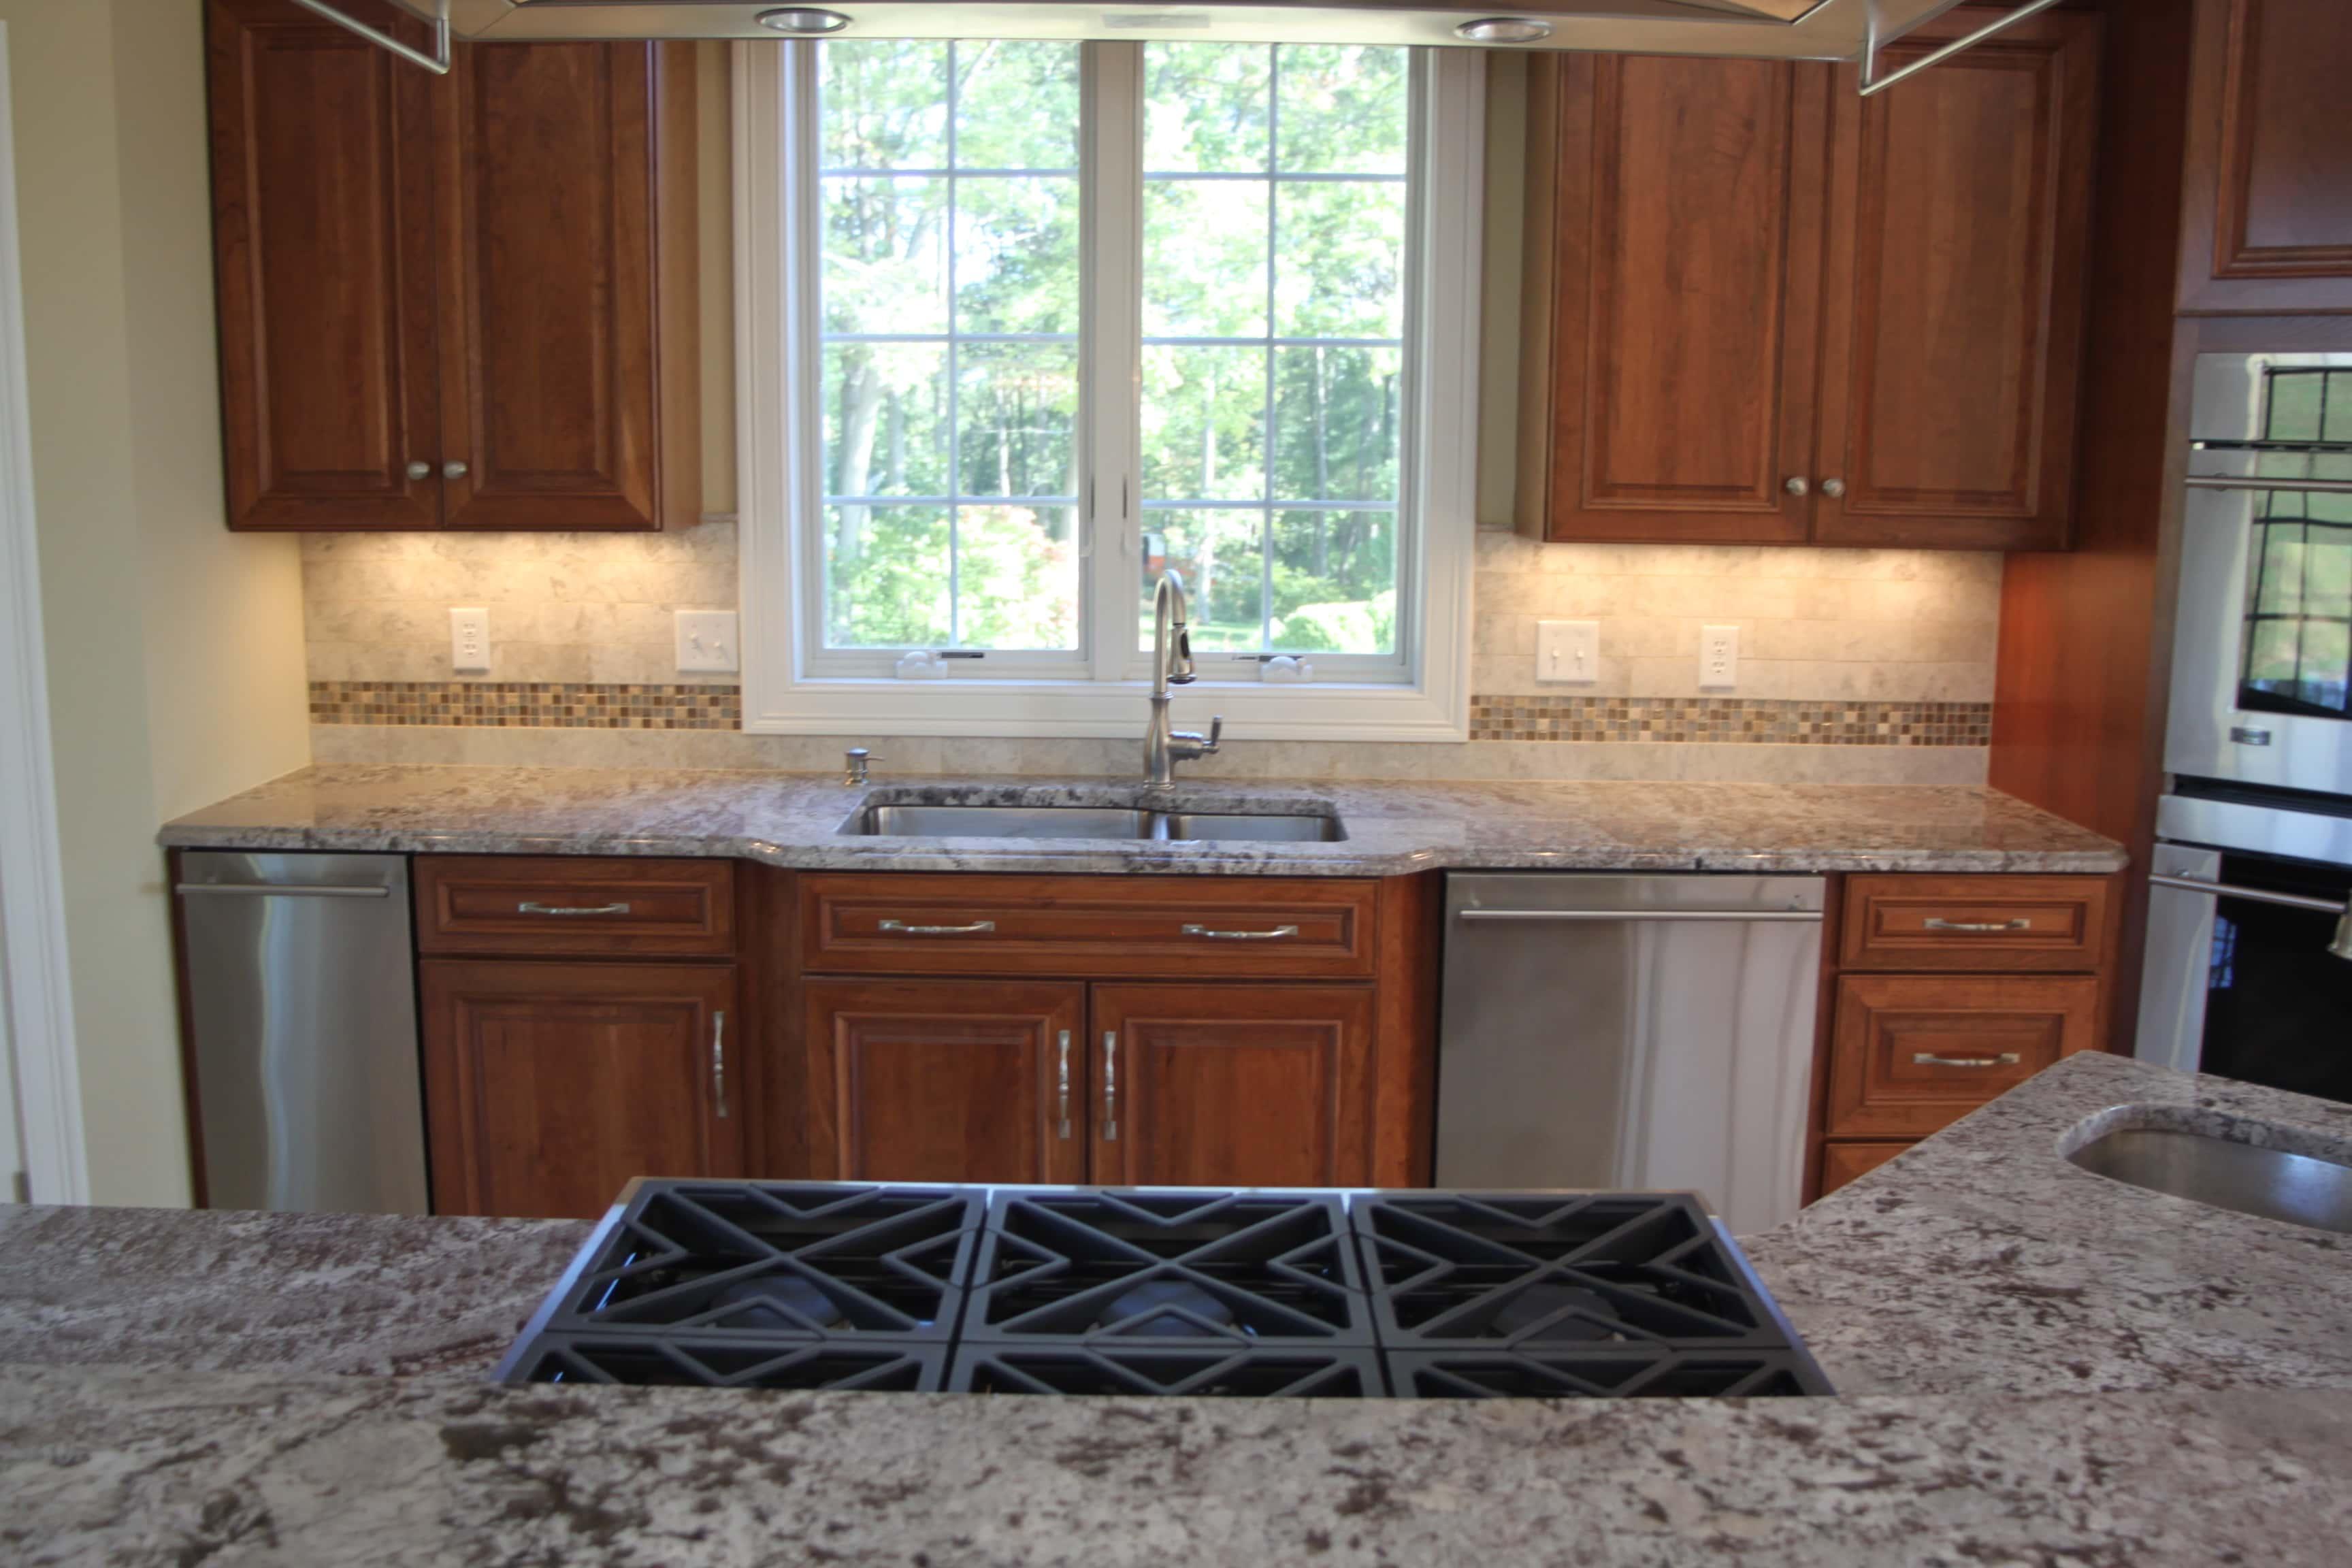 best kitchen floor corbels should your flooring match cabinets or countertops